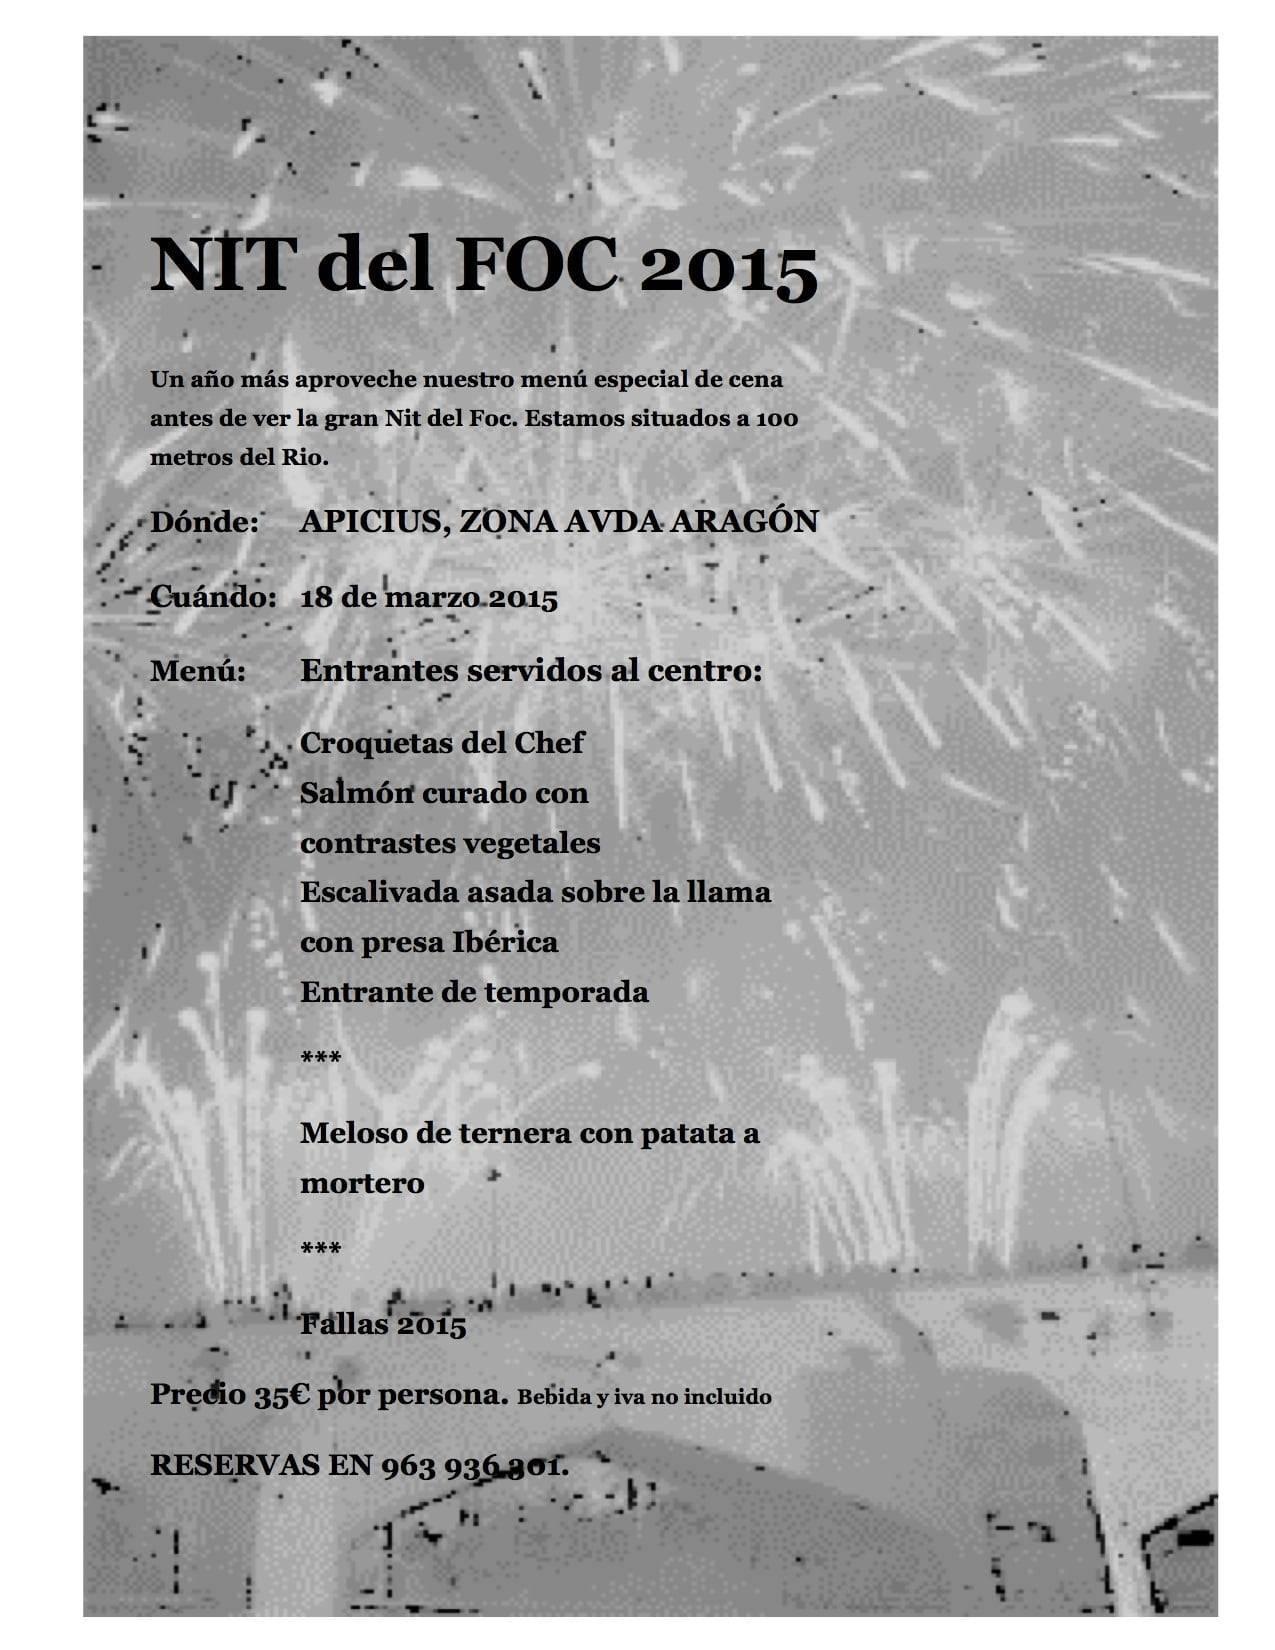 NIT del FOC 2015 copia